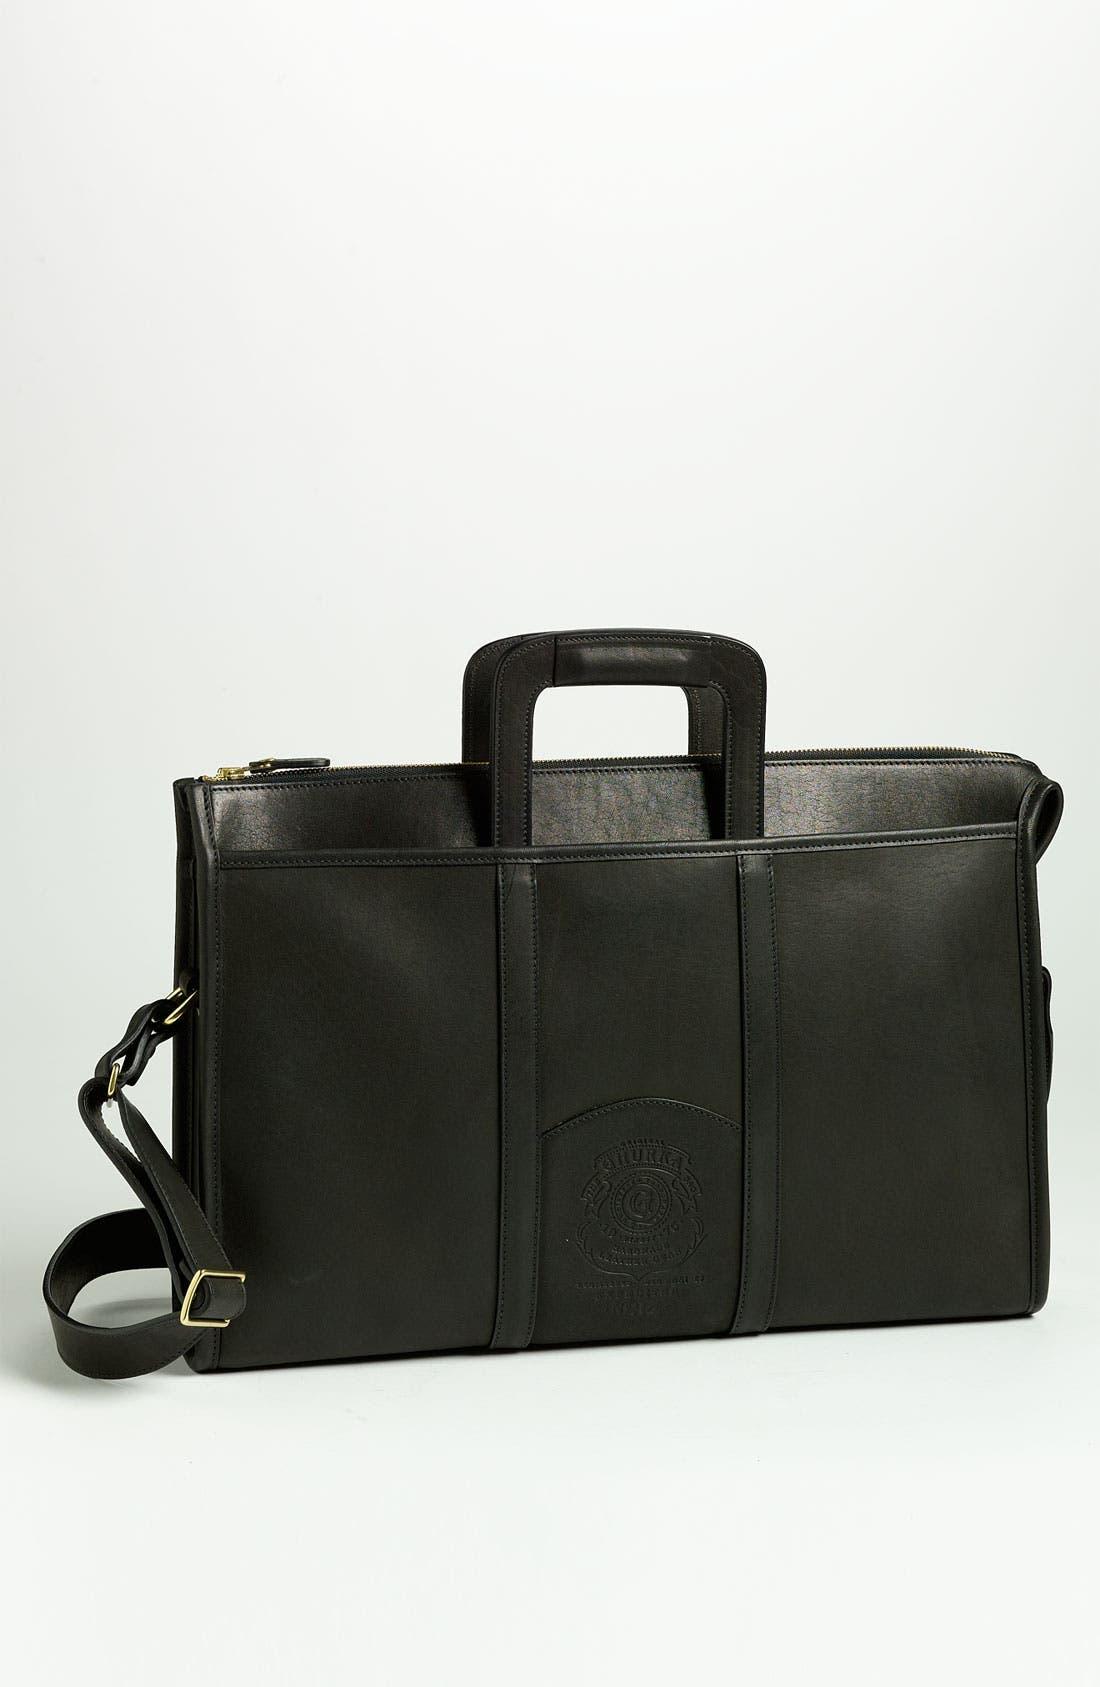 Alternate Image 1 Selected - Ghurka 'Expeditor' Leather Briefcase